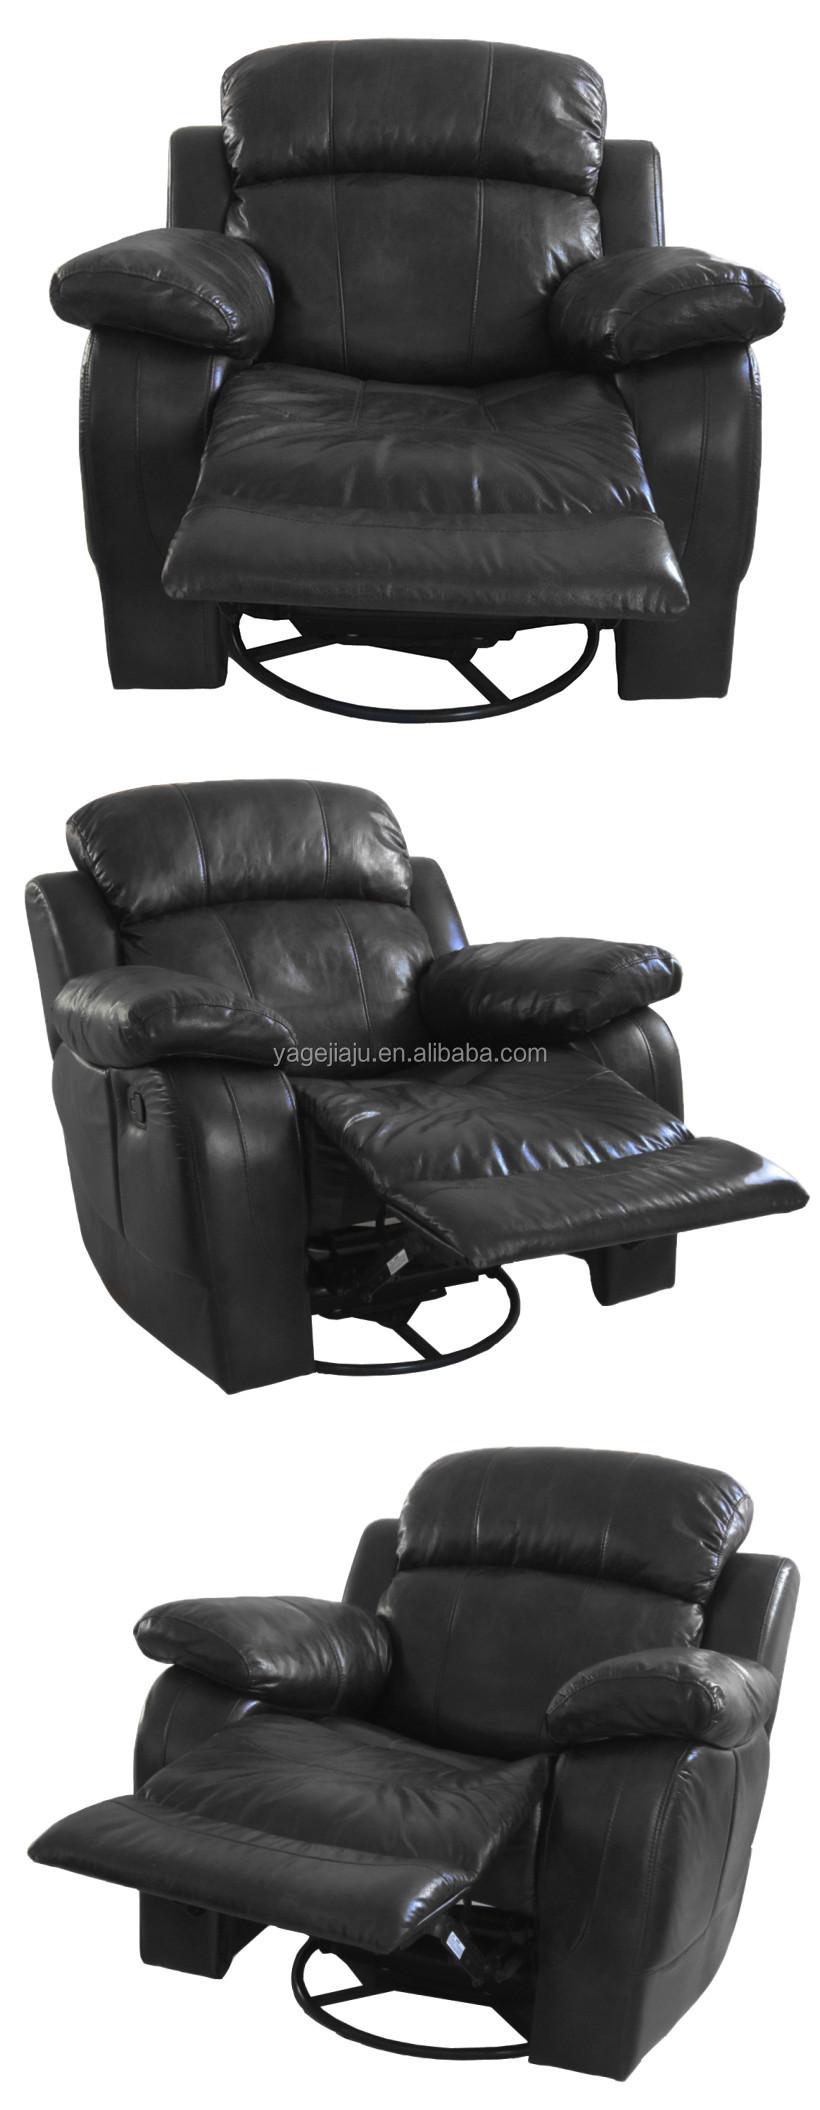 Lazy Boy Design A Room: Latest Lazy Boy Luxury Living Room Furniture 1 Seater